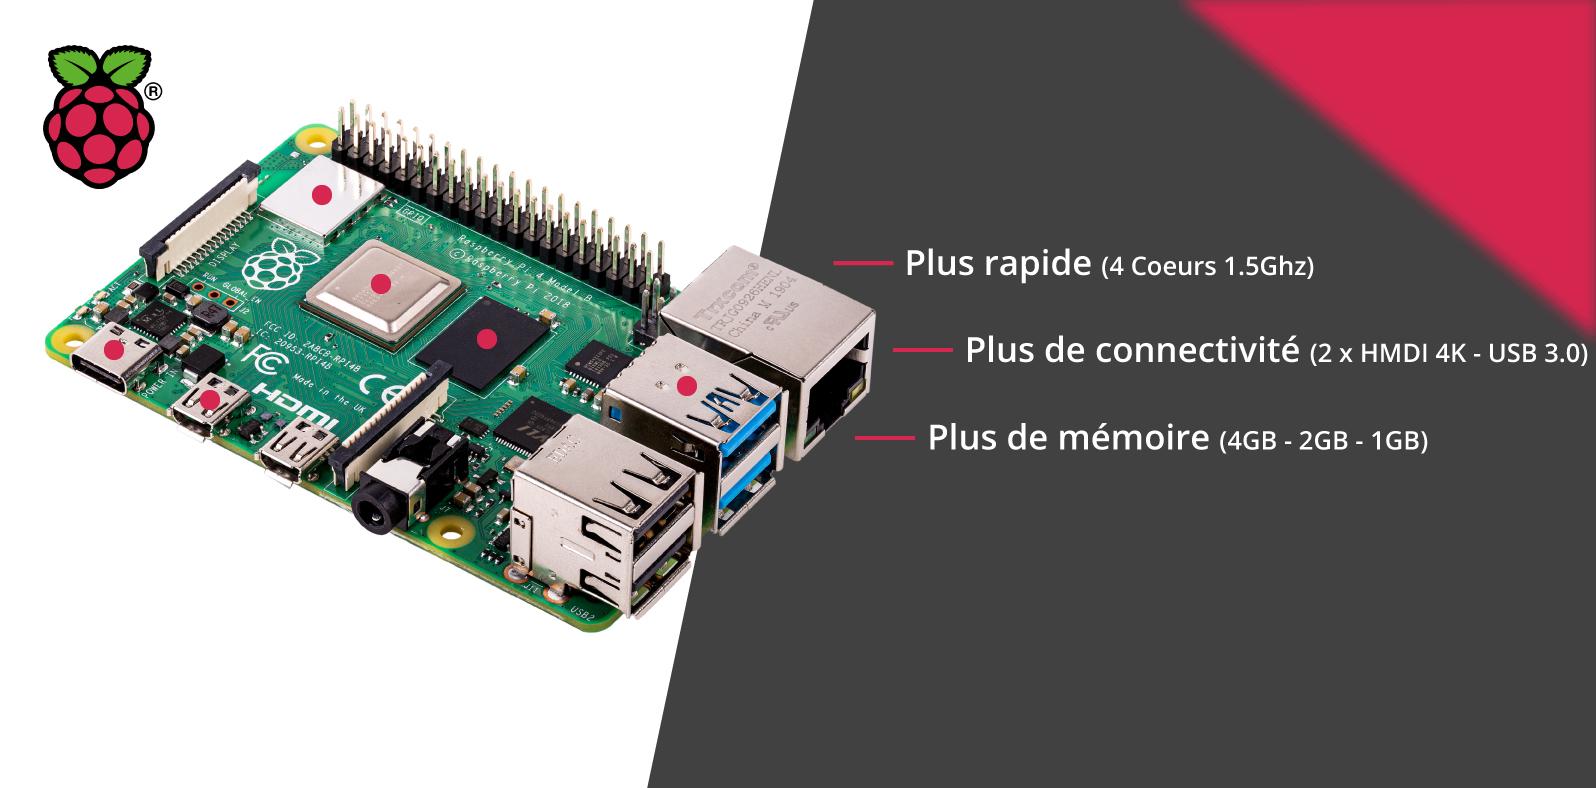 Yadom presente le nouveau Raspberry Pi 4 b